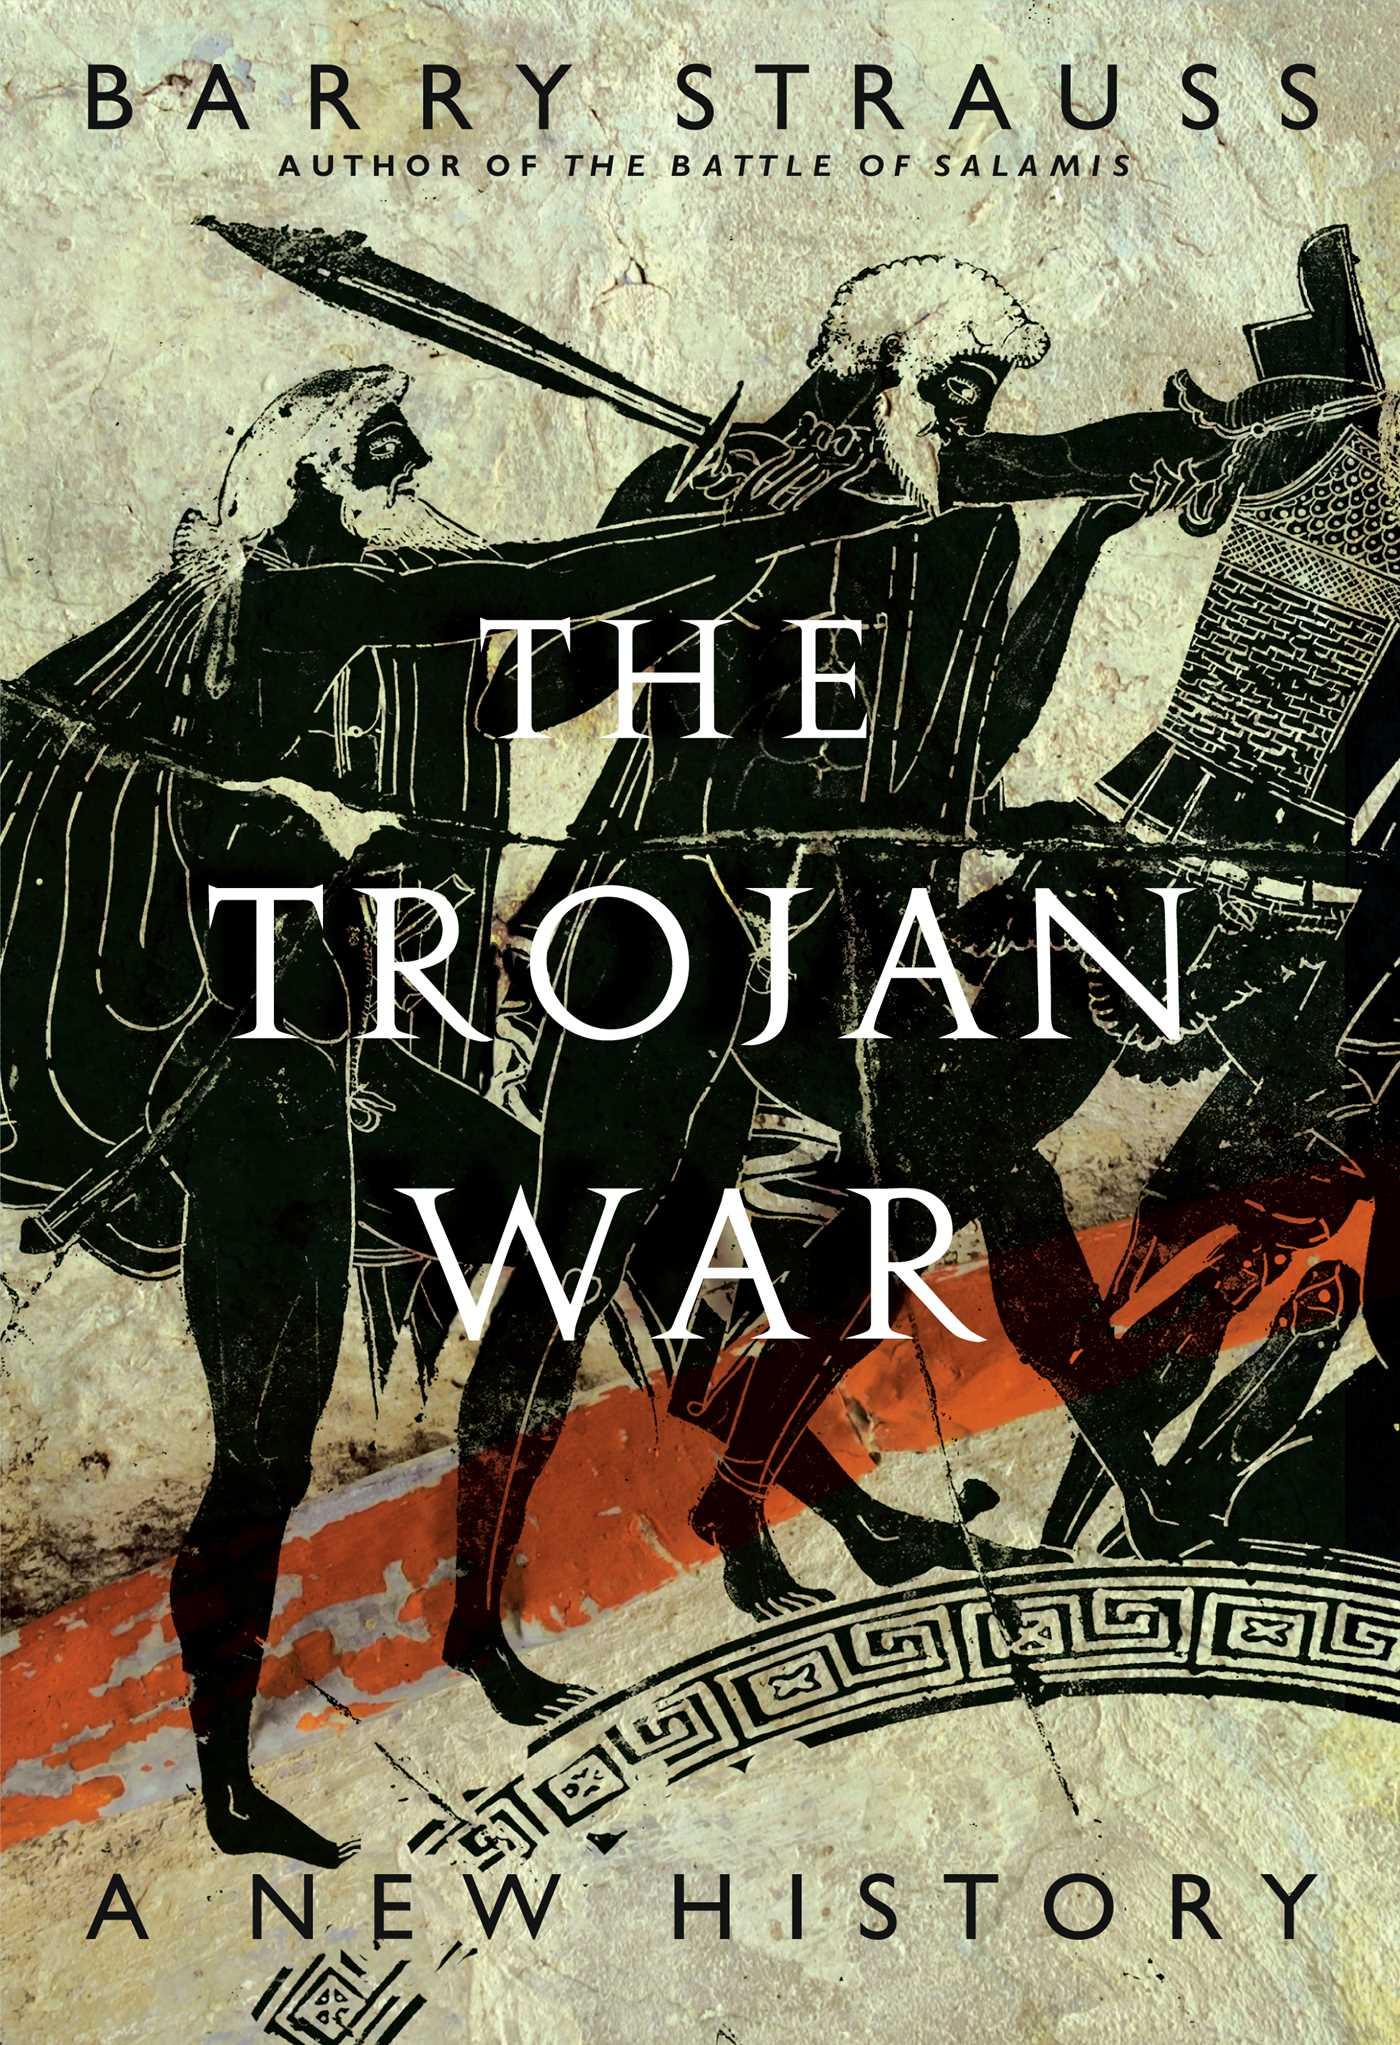 Trojan war 9780743293624 hr